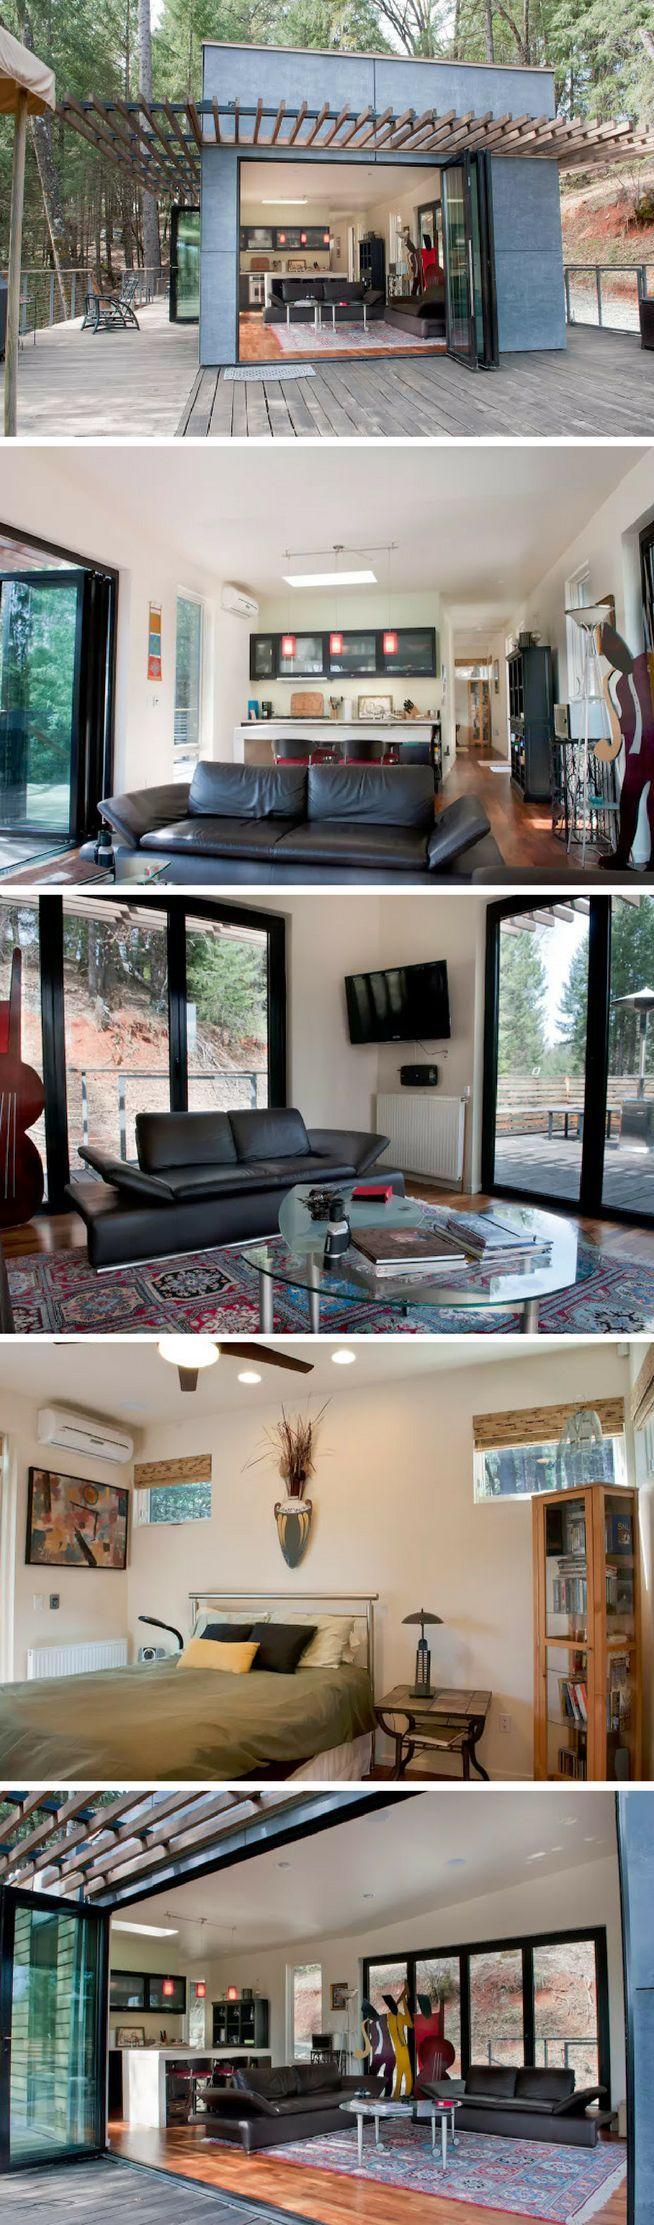 An award winning modern cabin in Grass Valley, California